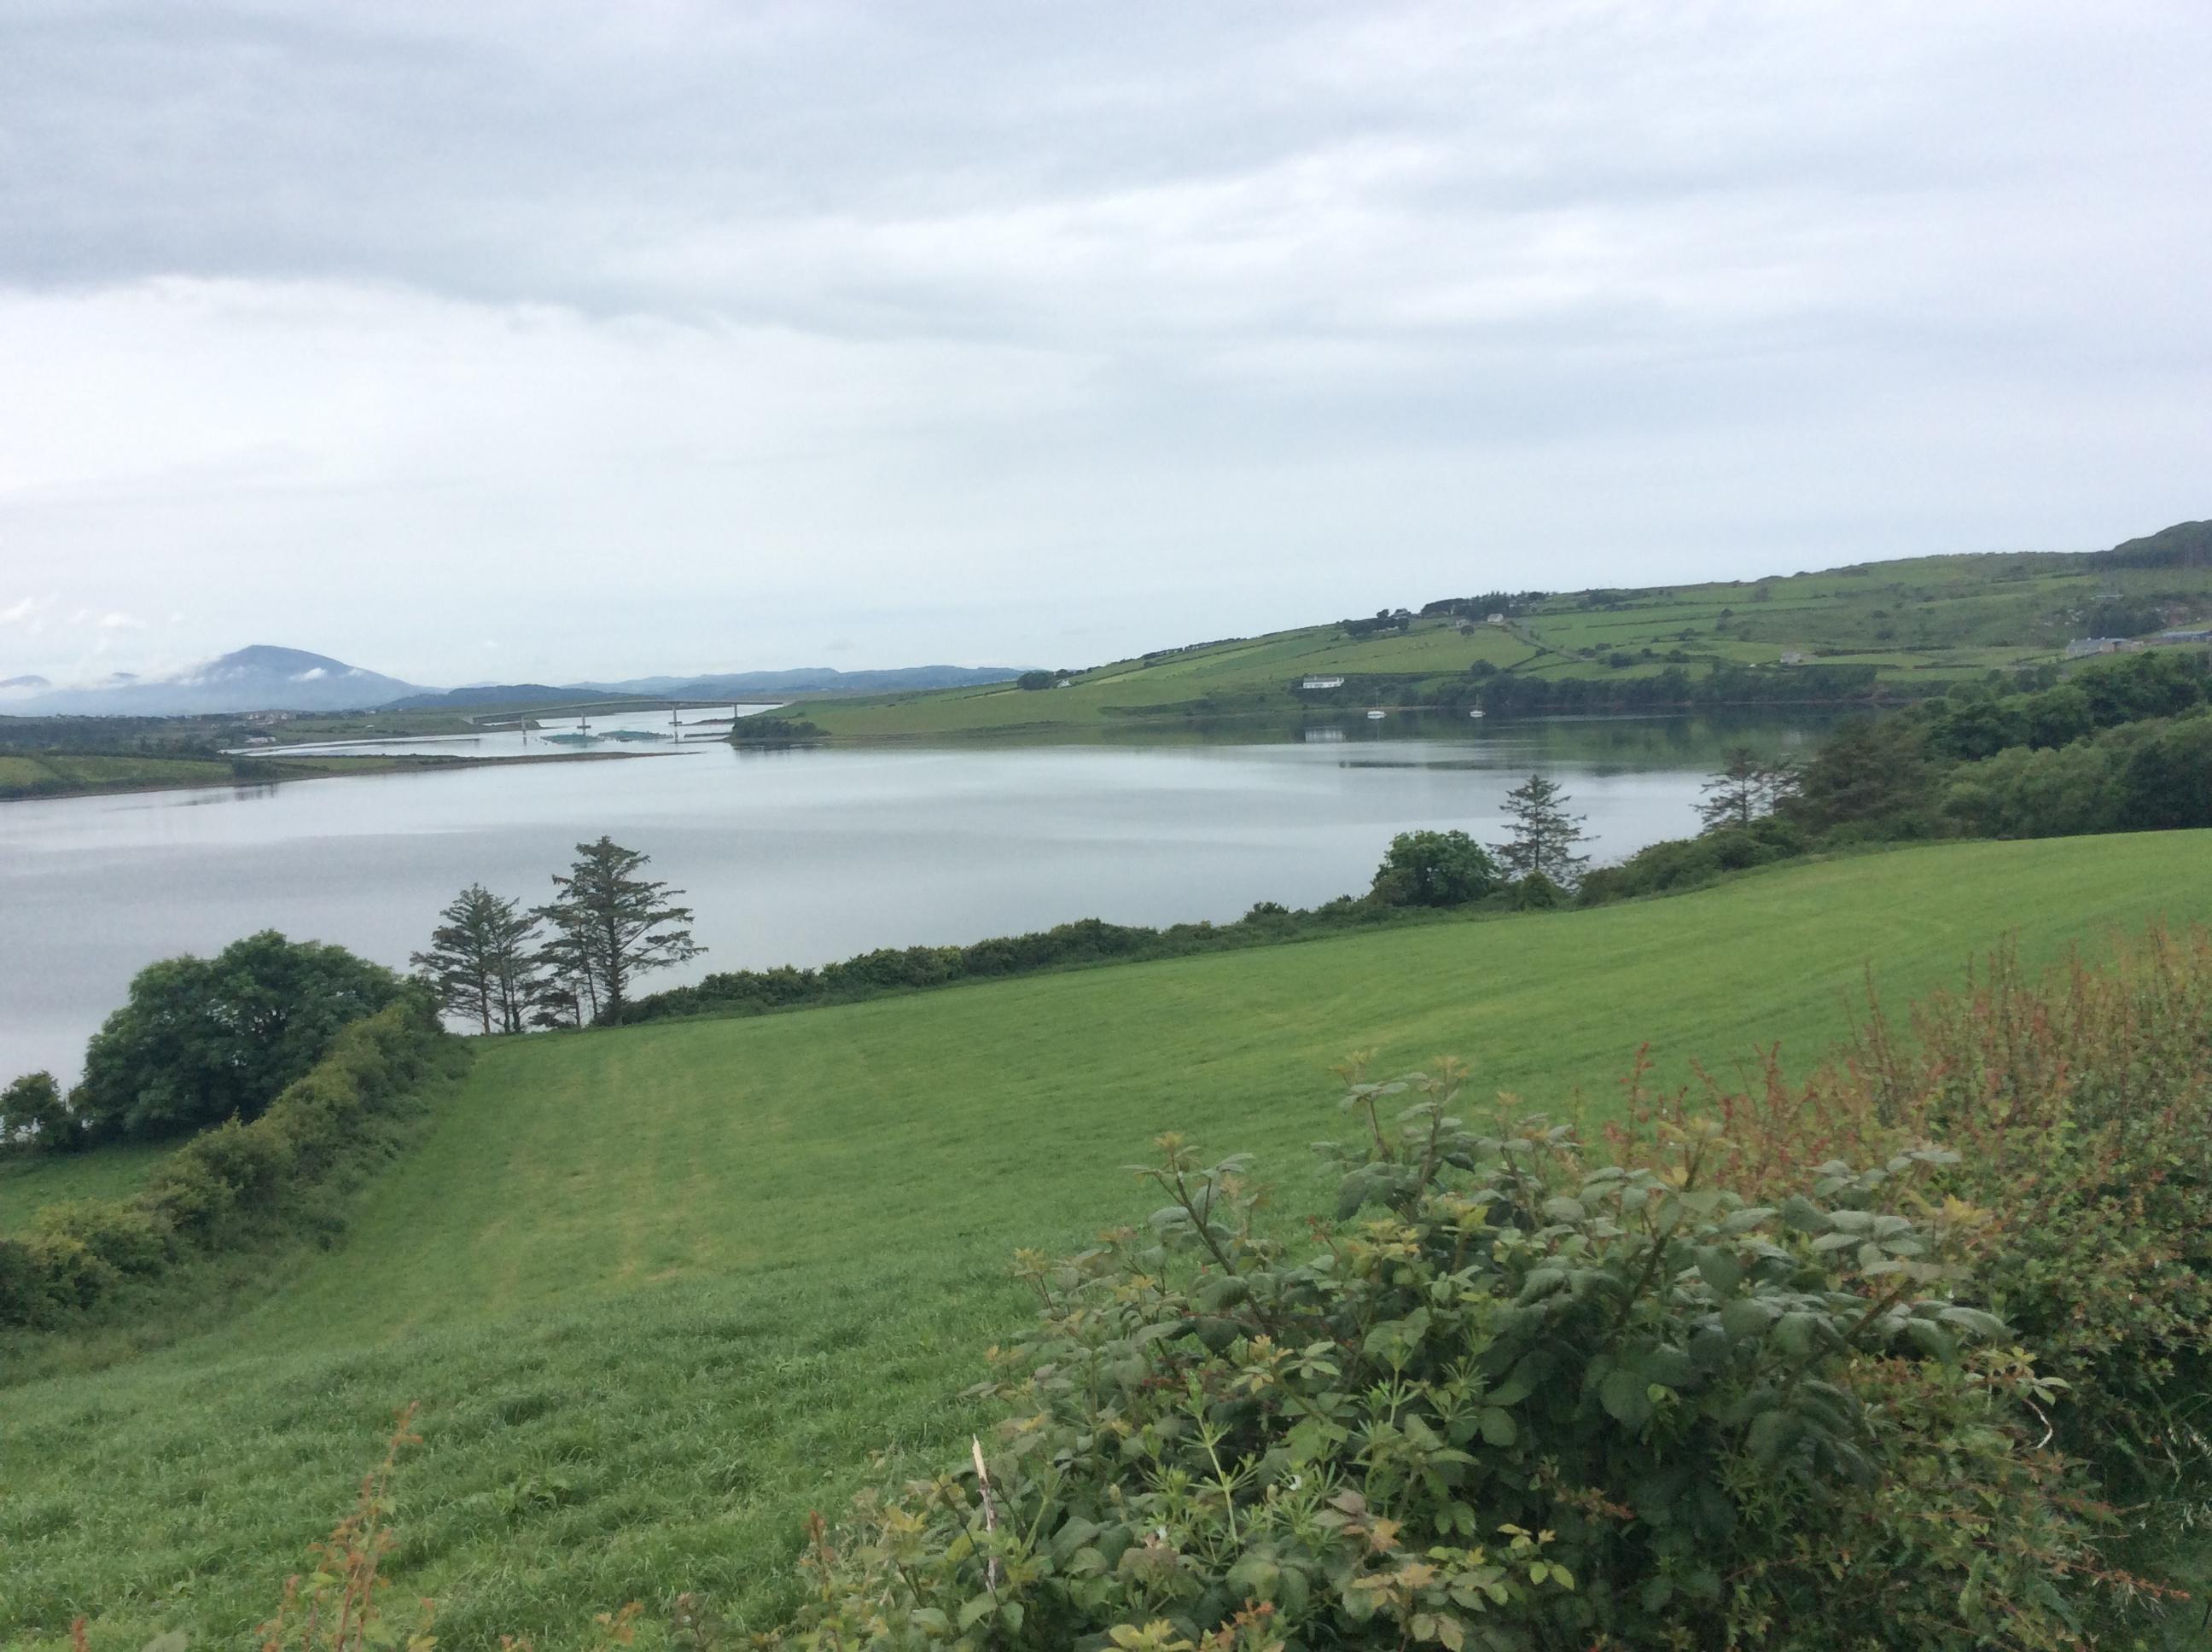 A bridge links Rosguill and Fanad peninsulas